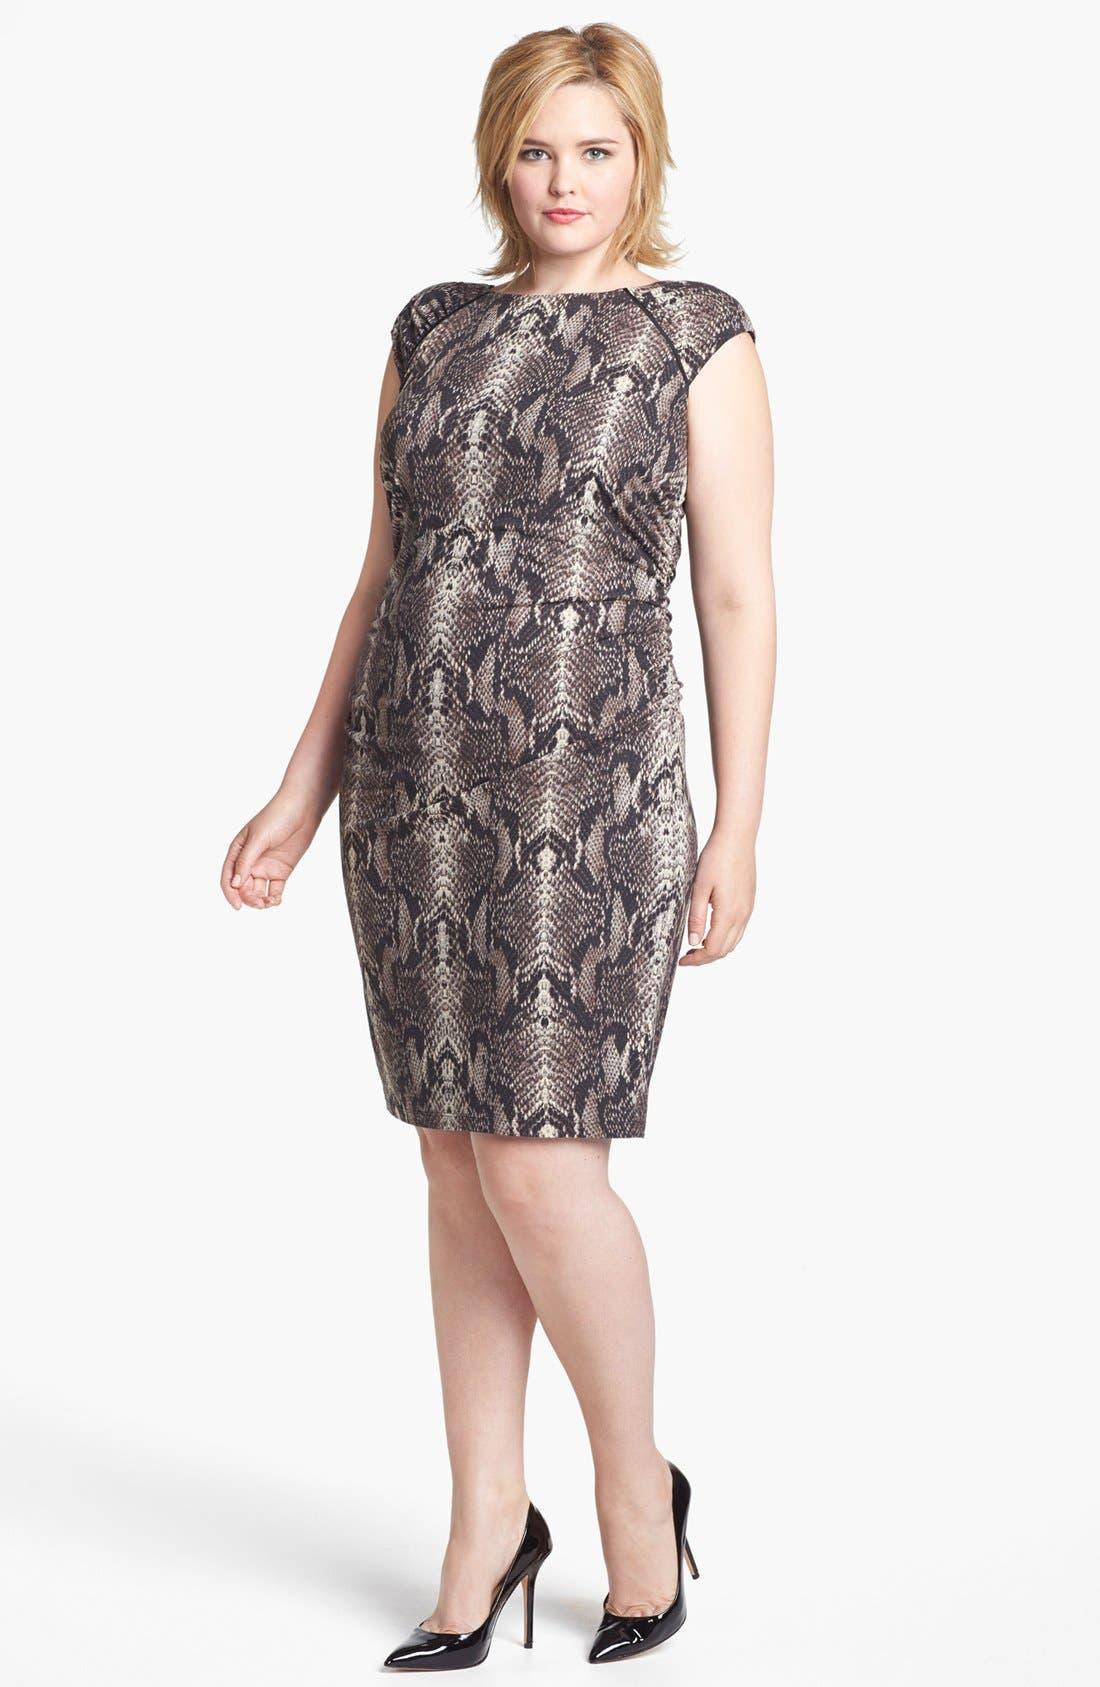 Alternate Image 1 Selected - Ivy & Blu Ruched Sheath Dress (Plus Size)